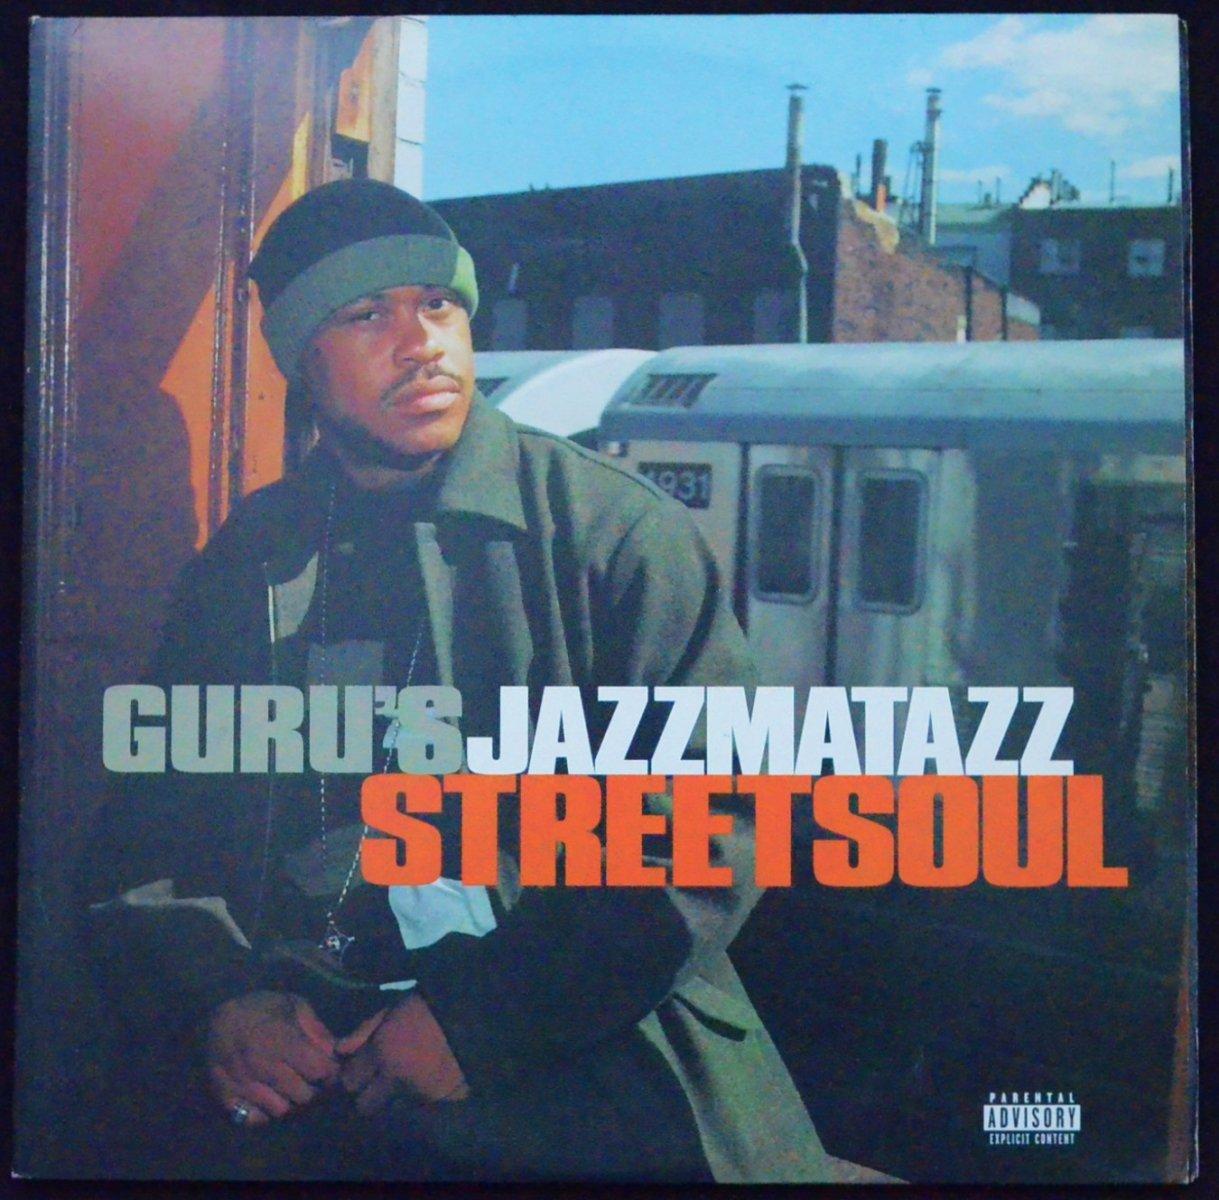 GURU / JAZZMATAZZ (STREETSOUL) (2LP)